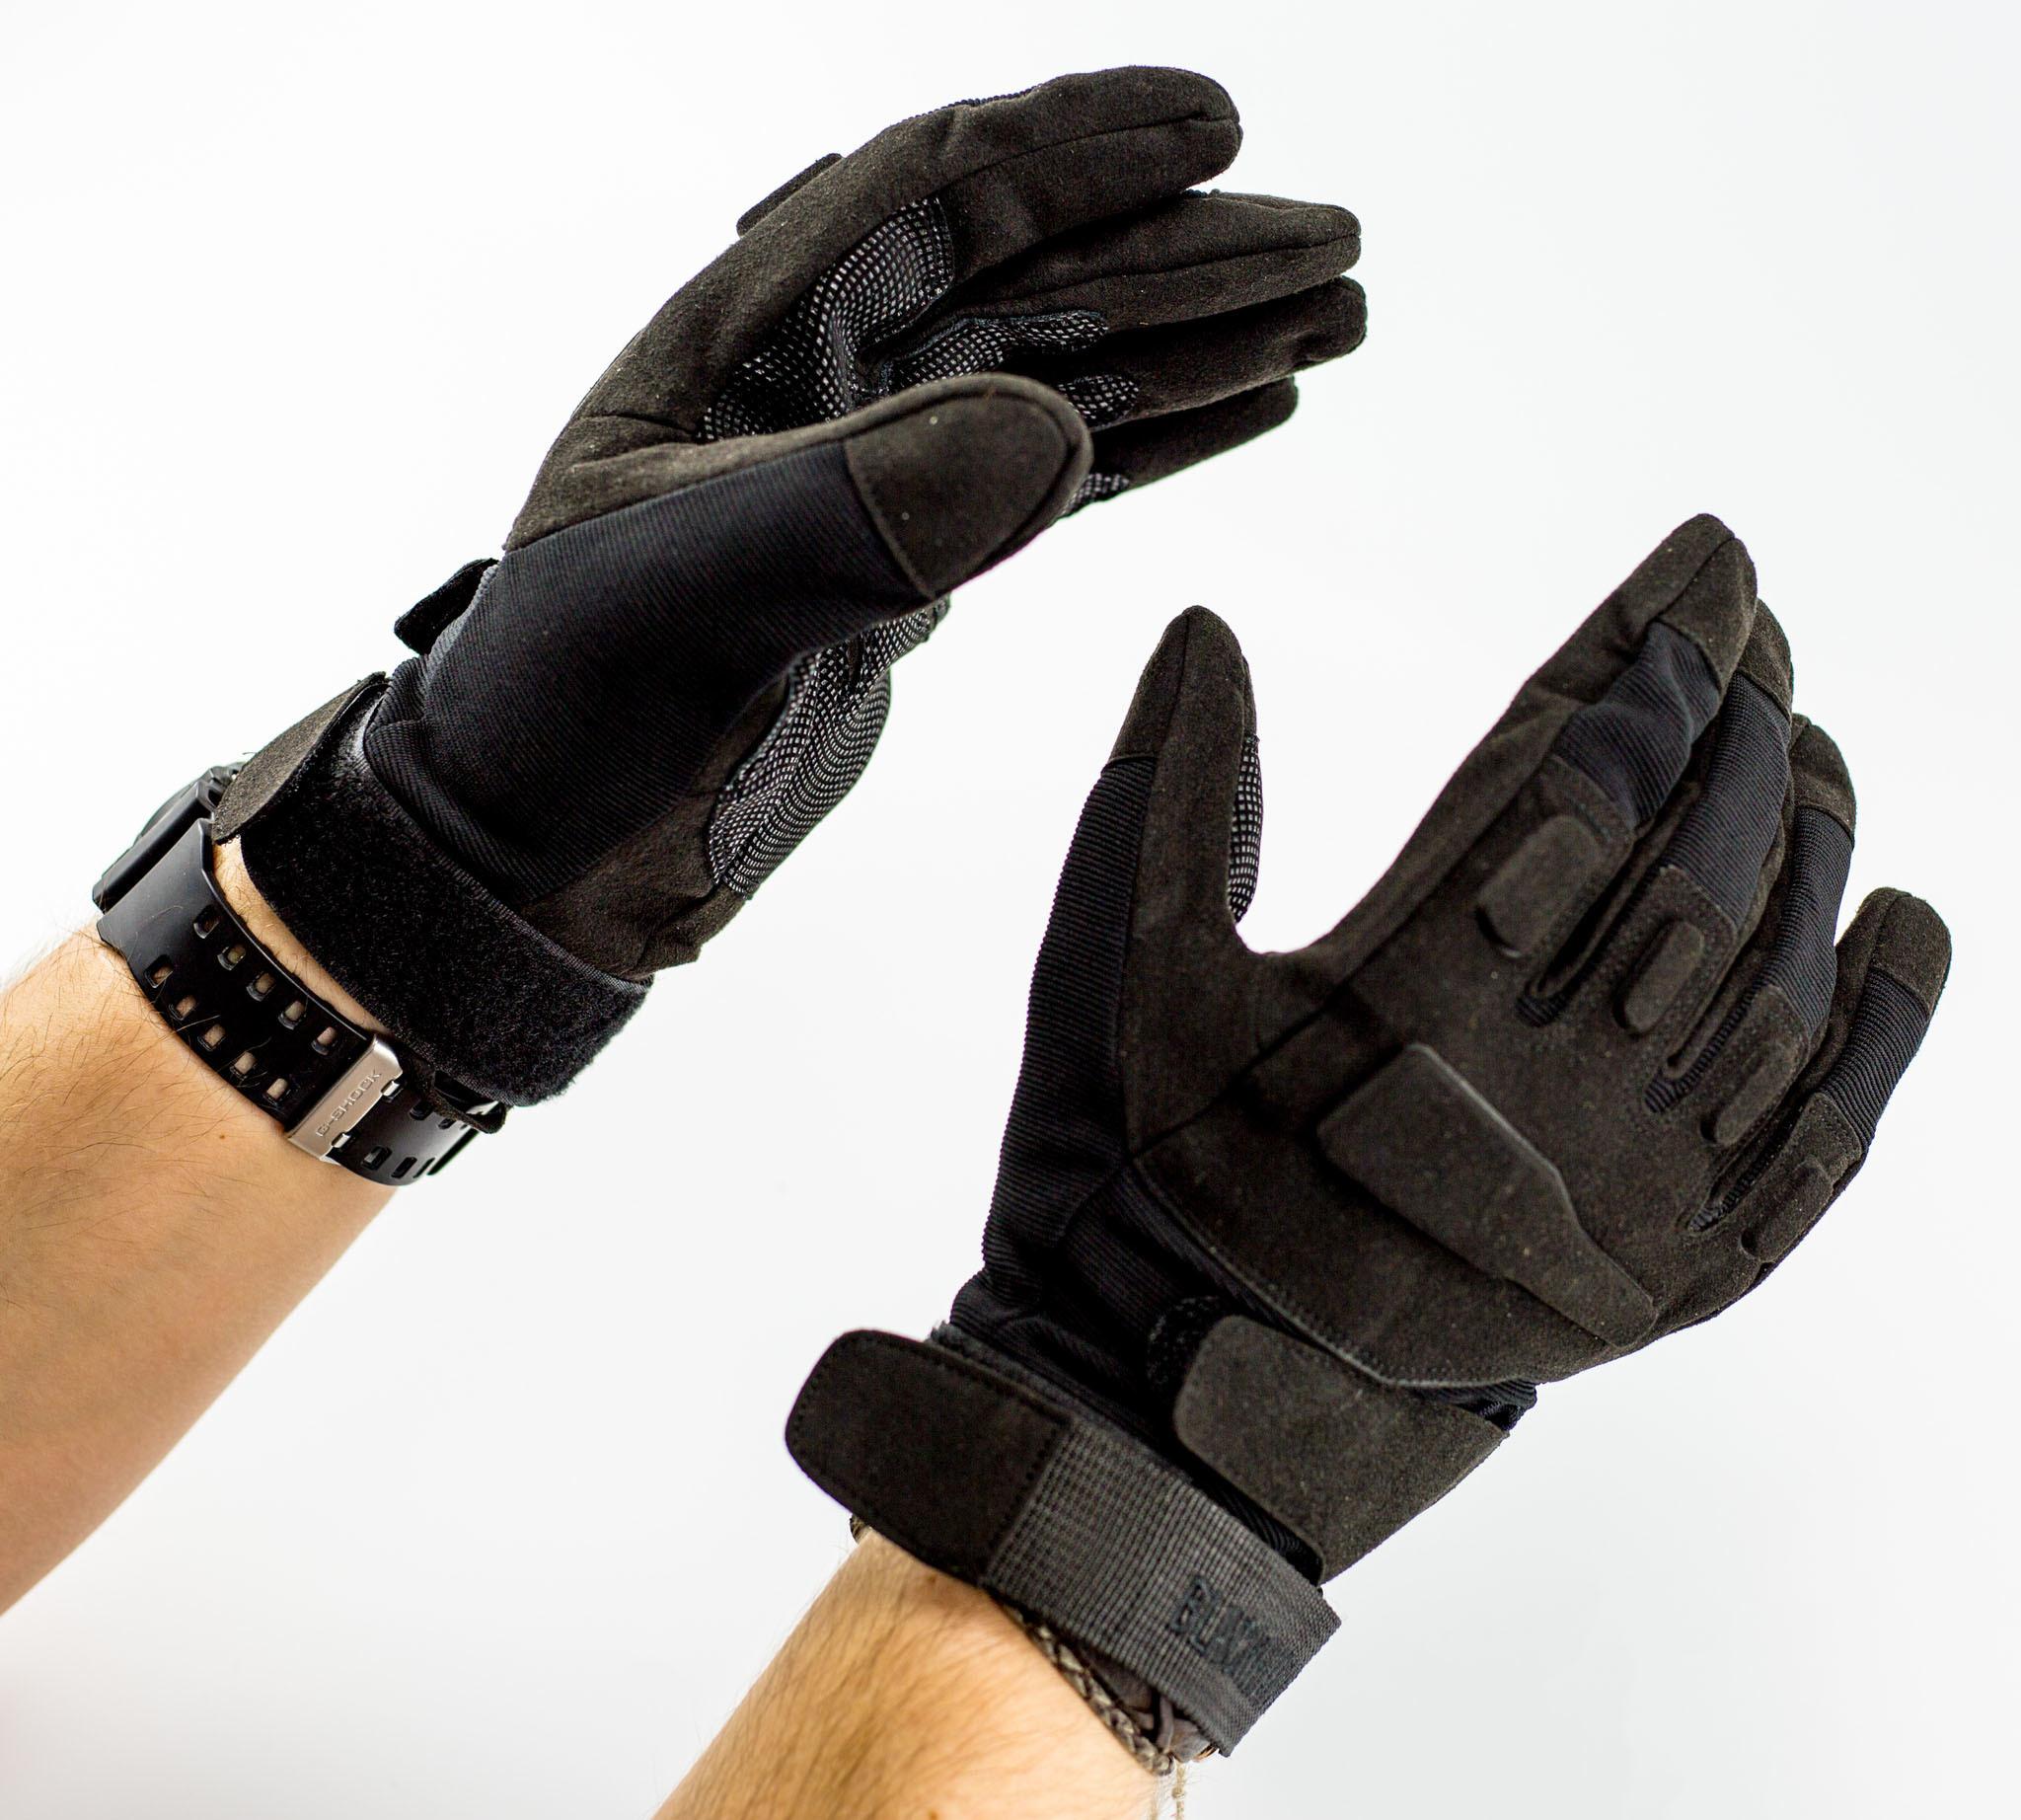 Тактические перчатки Blackhawk от China Factory